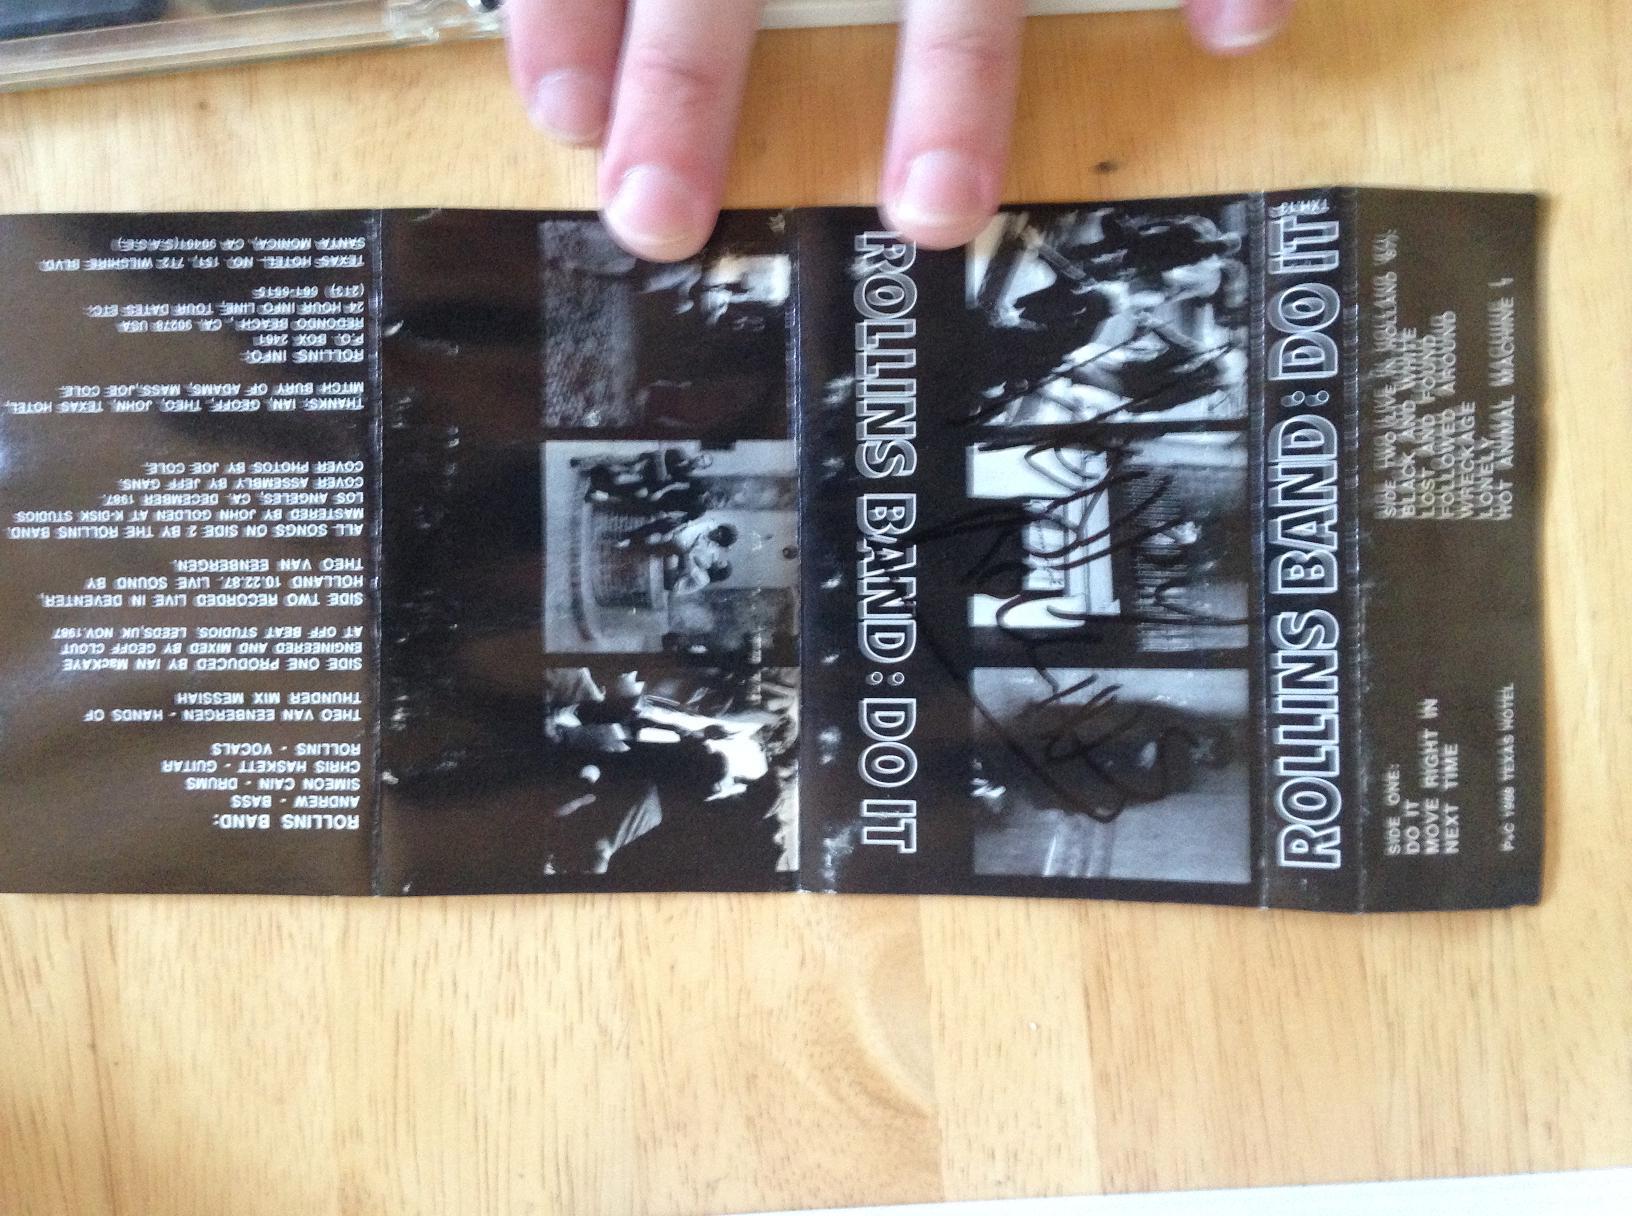 rollins band do it cassette 3